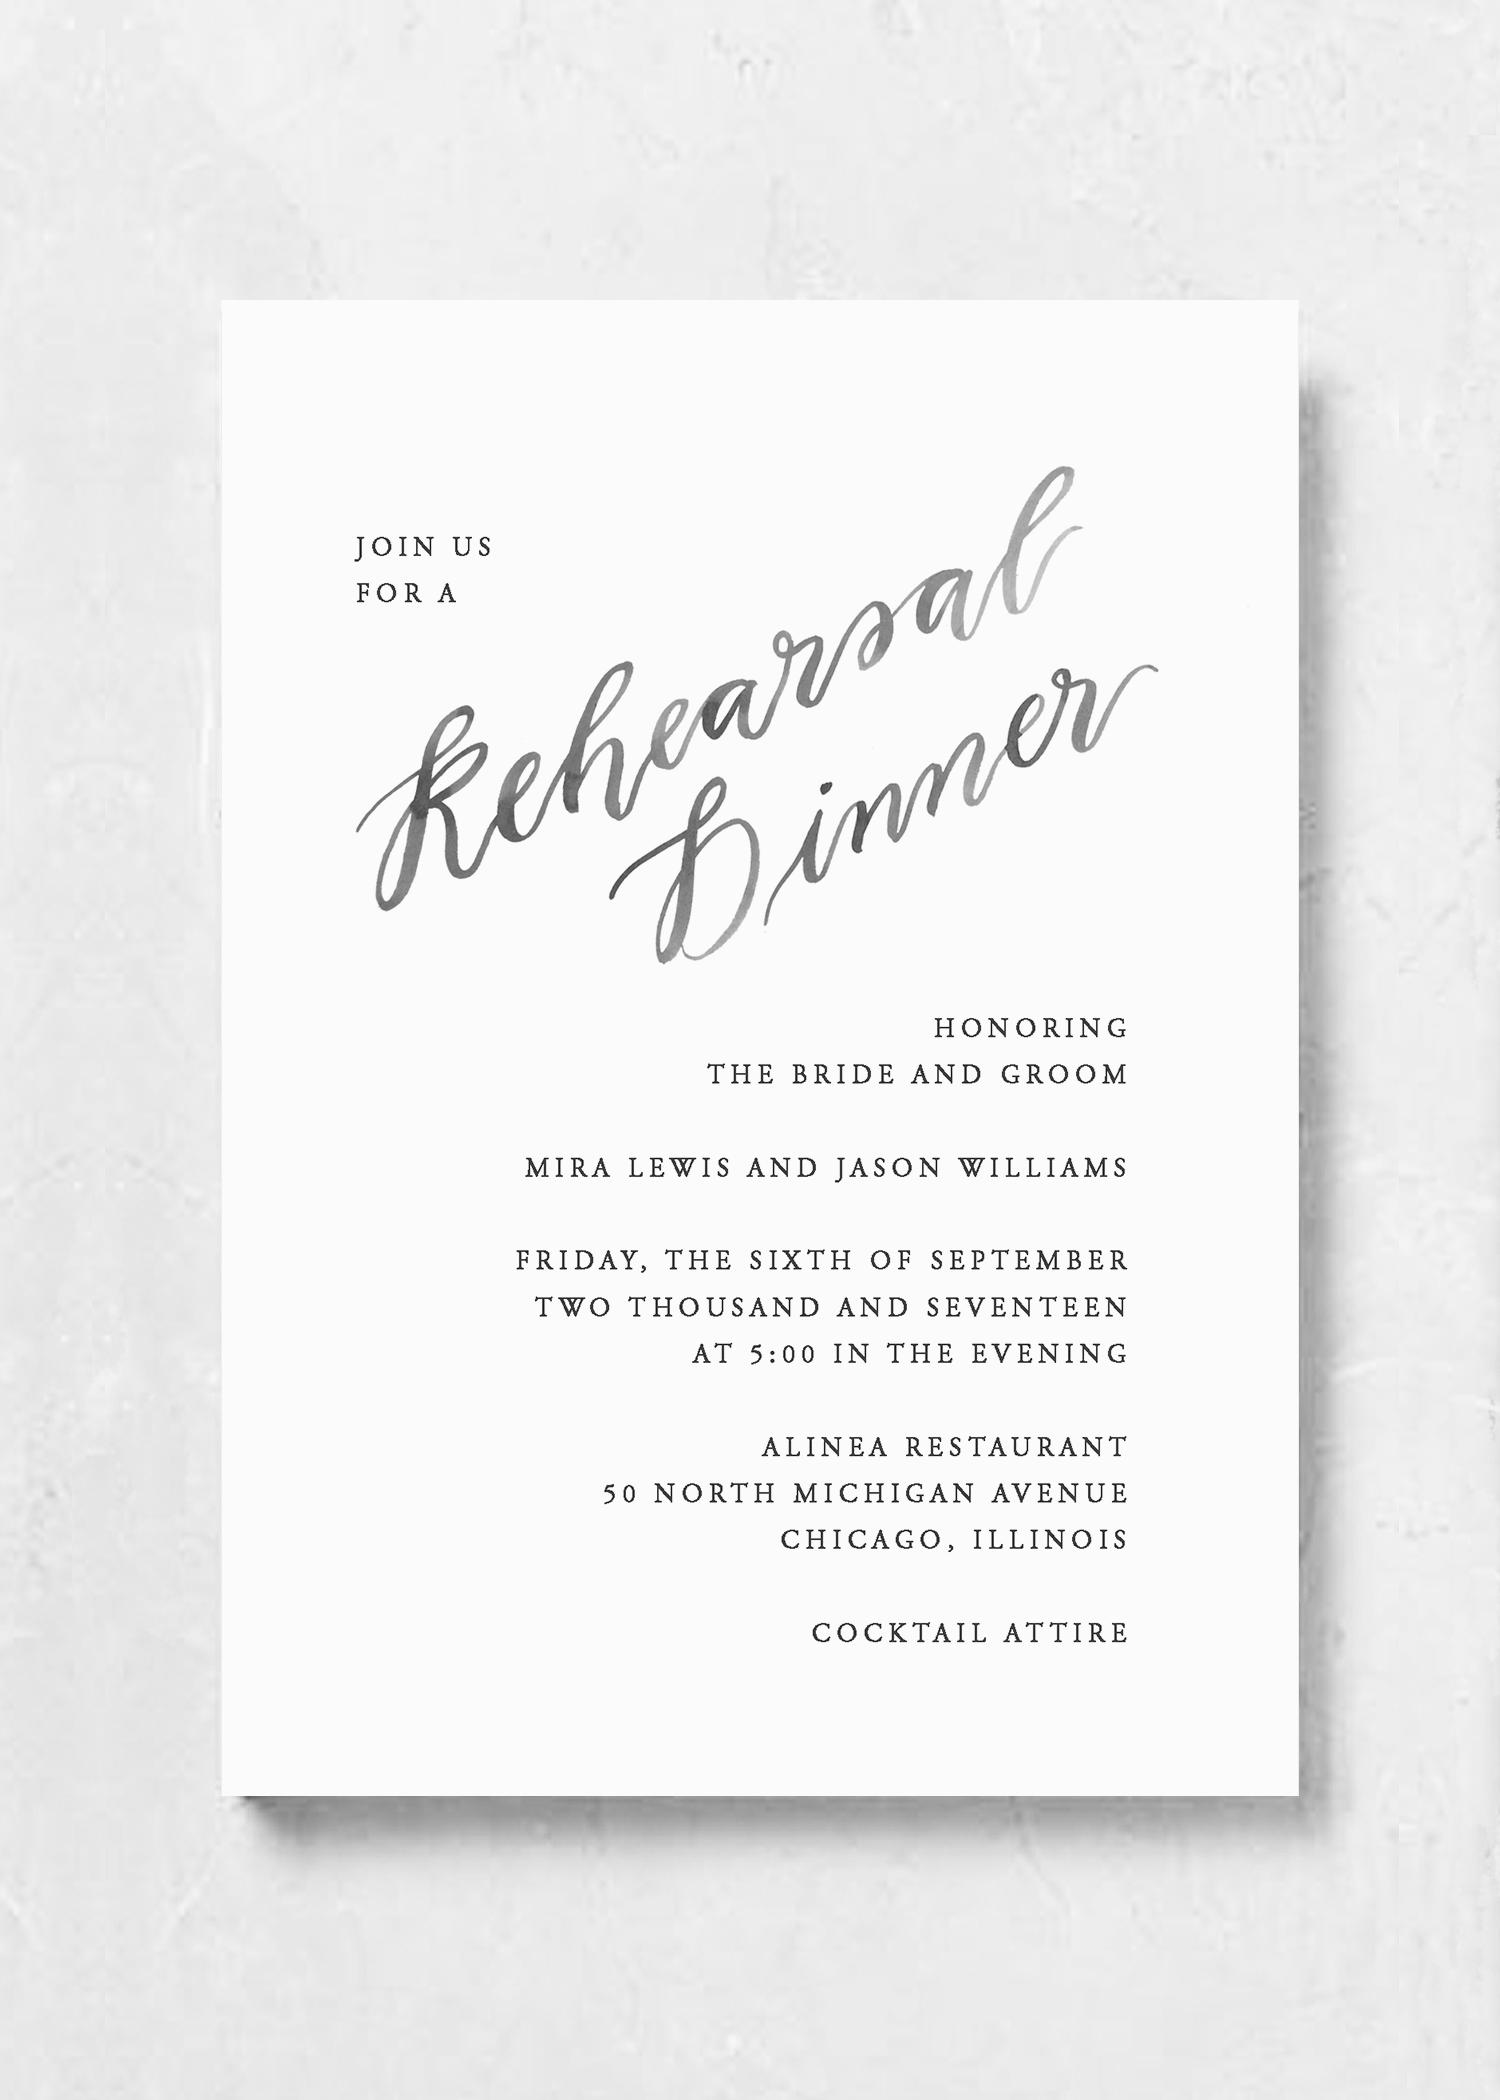 EVENT INVITATION